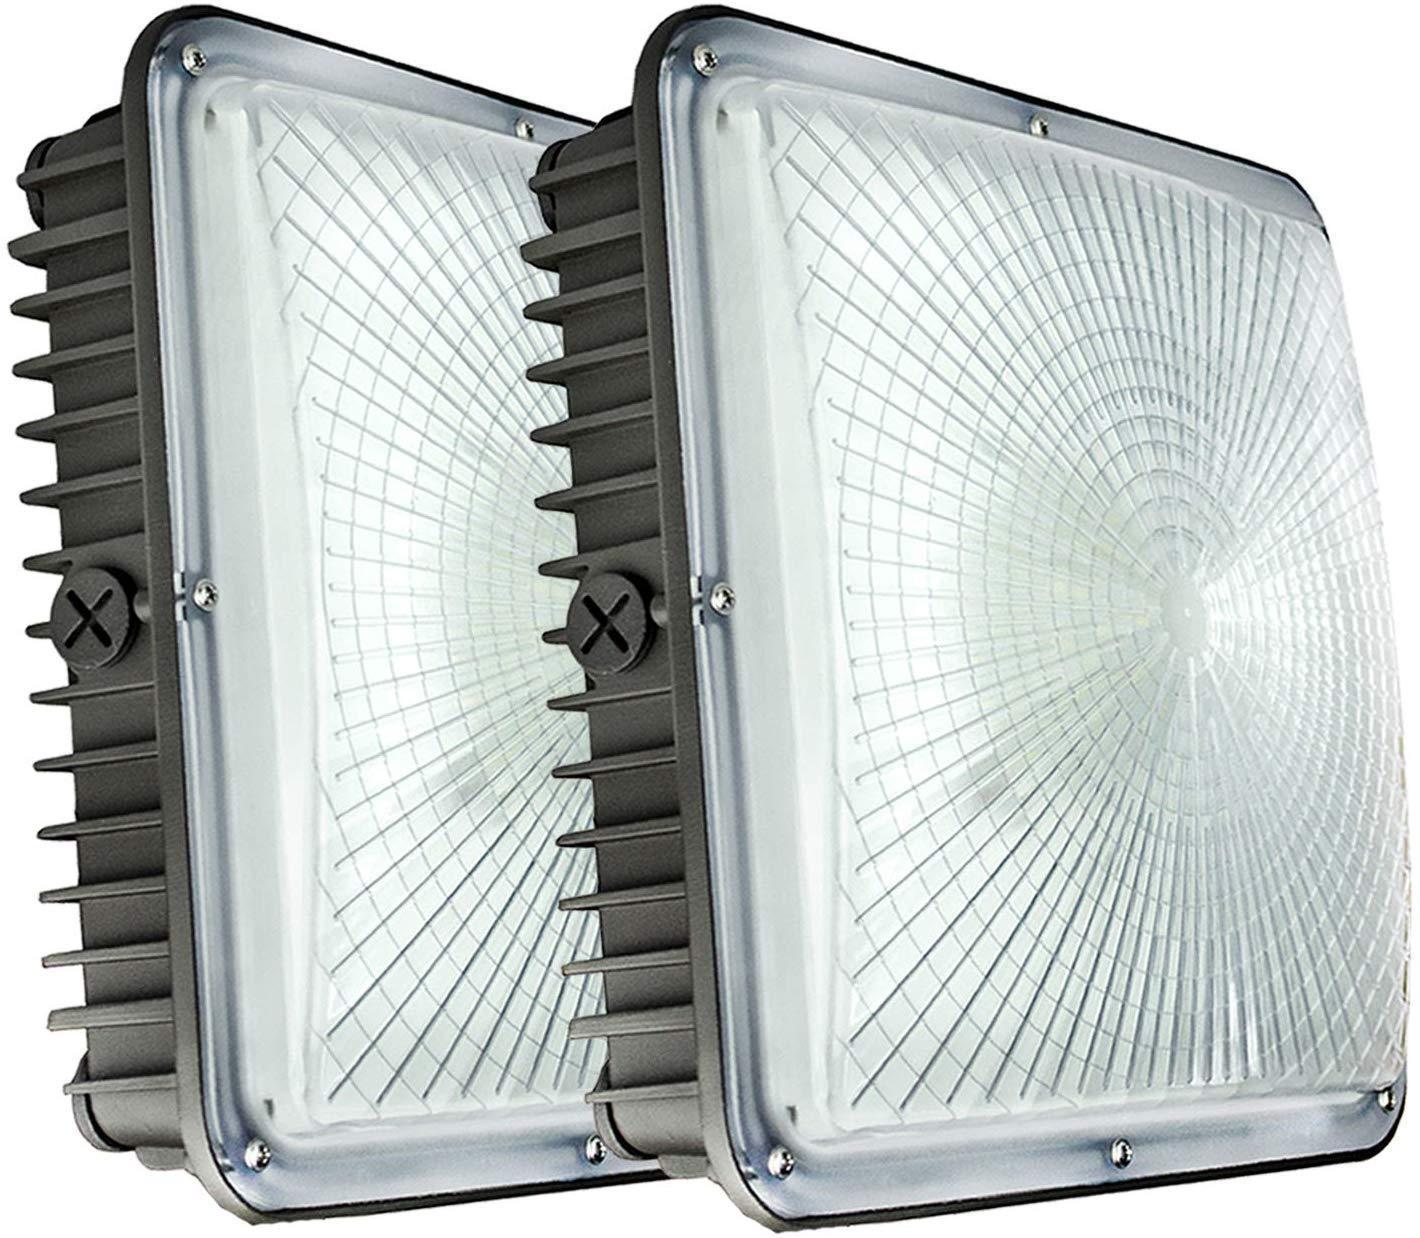 "70W светодиодные Canopy Lights, 8400 люмен 5500K белый, 9,5"" х 9,5"" , 120В 277V для АЗС, тренажерный зал, склад, гараж, двор (2-Pack 70W)"